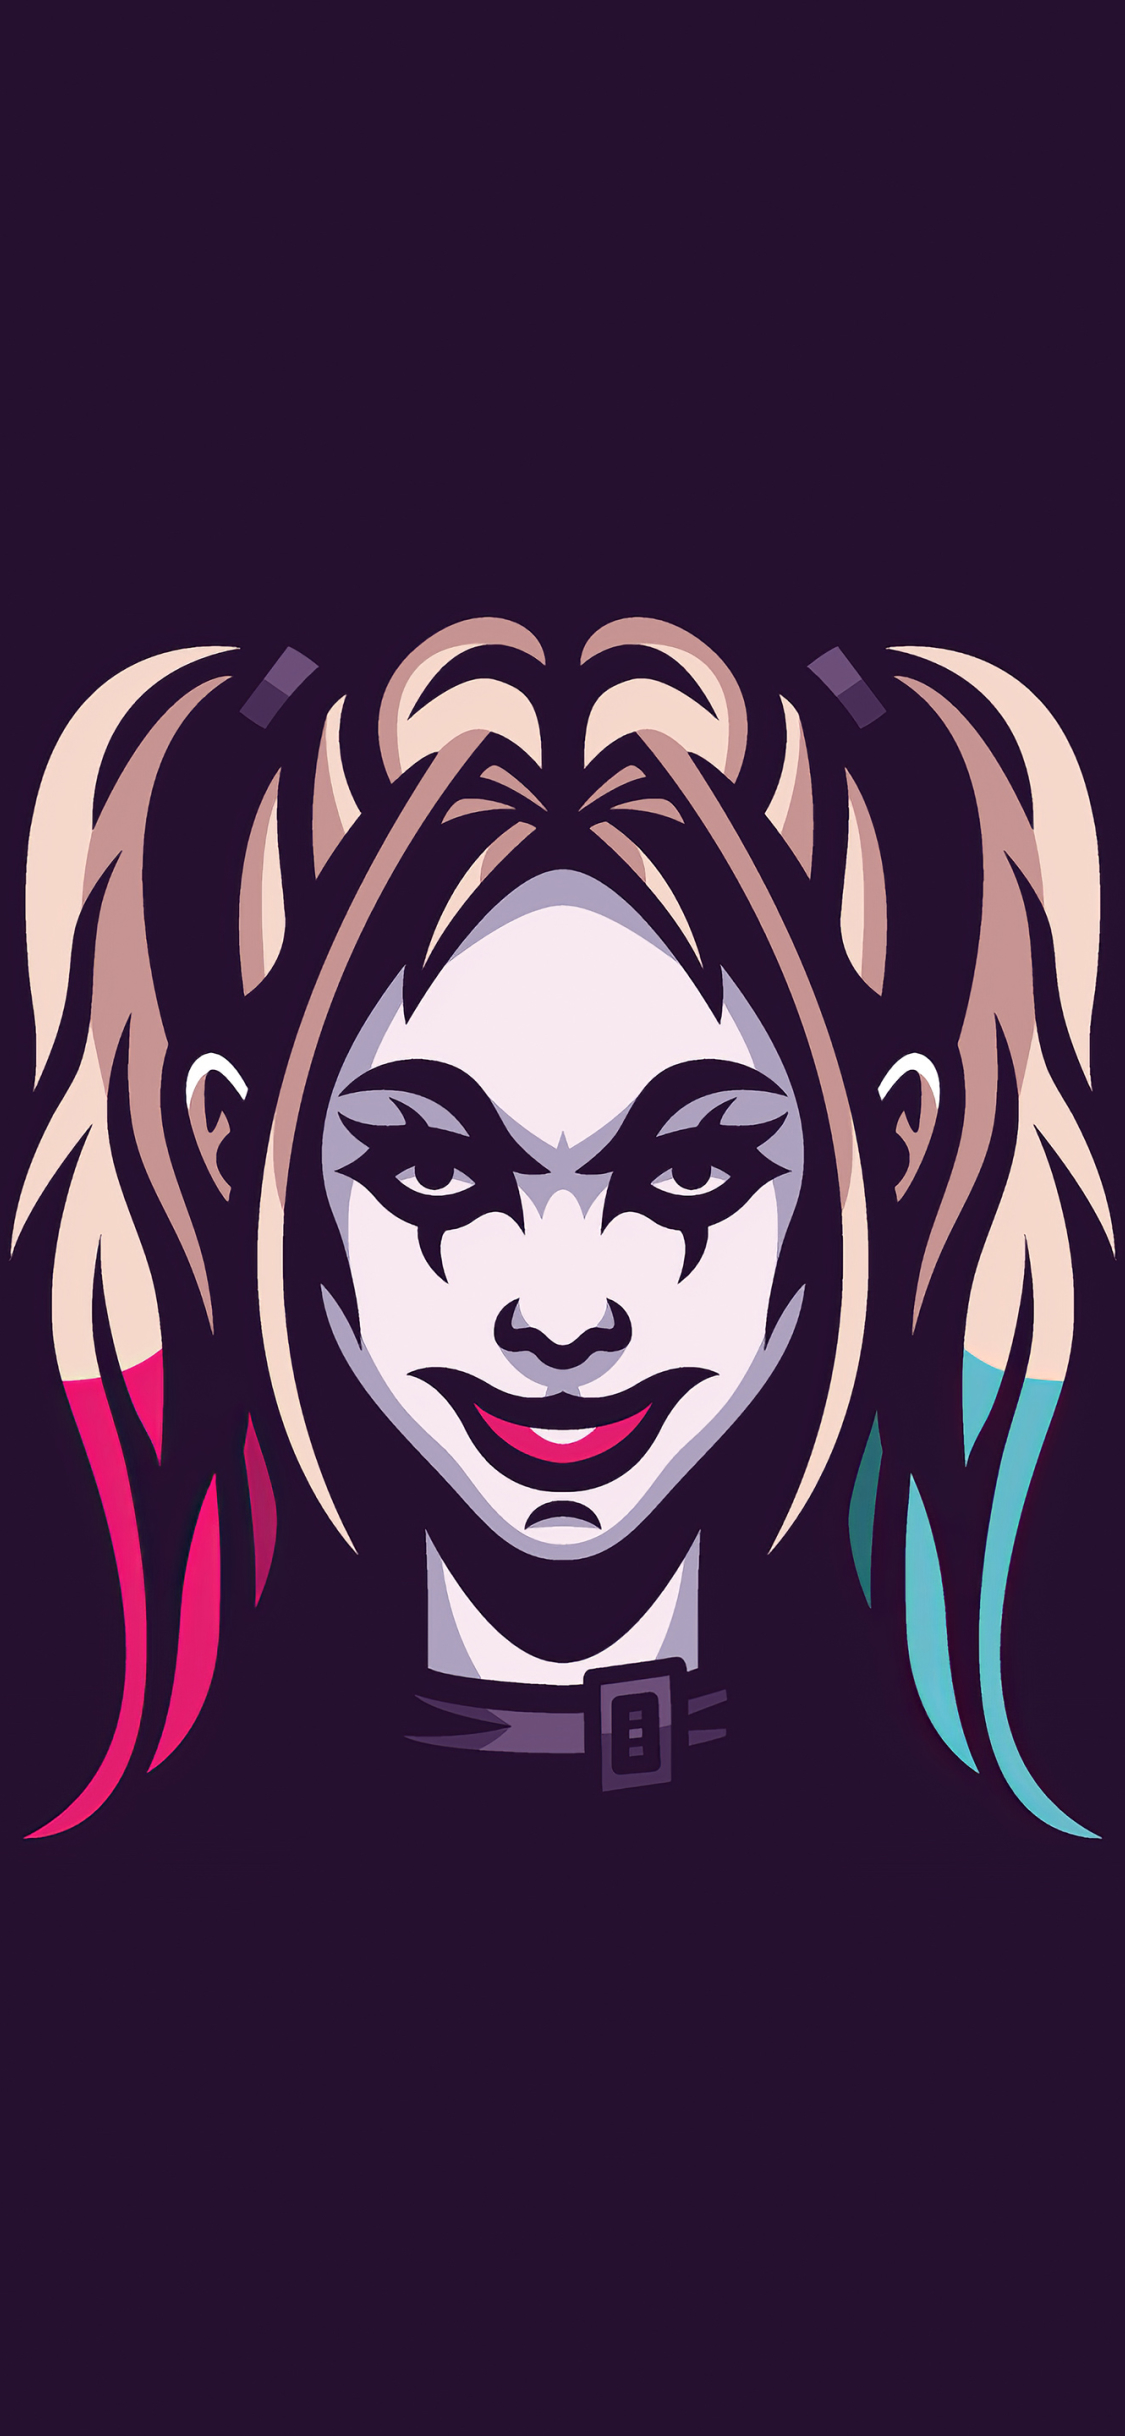 1125x2436 4k Harley Quinn Minimal Art Iphone XS,Iphone 10 ...